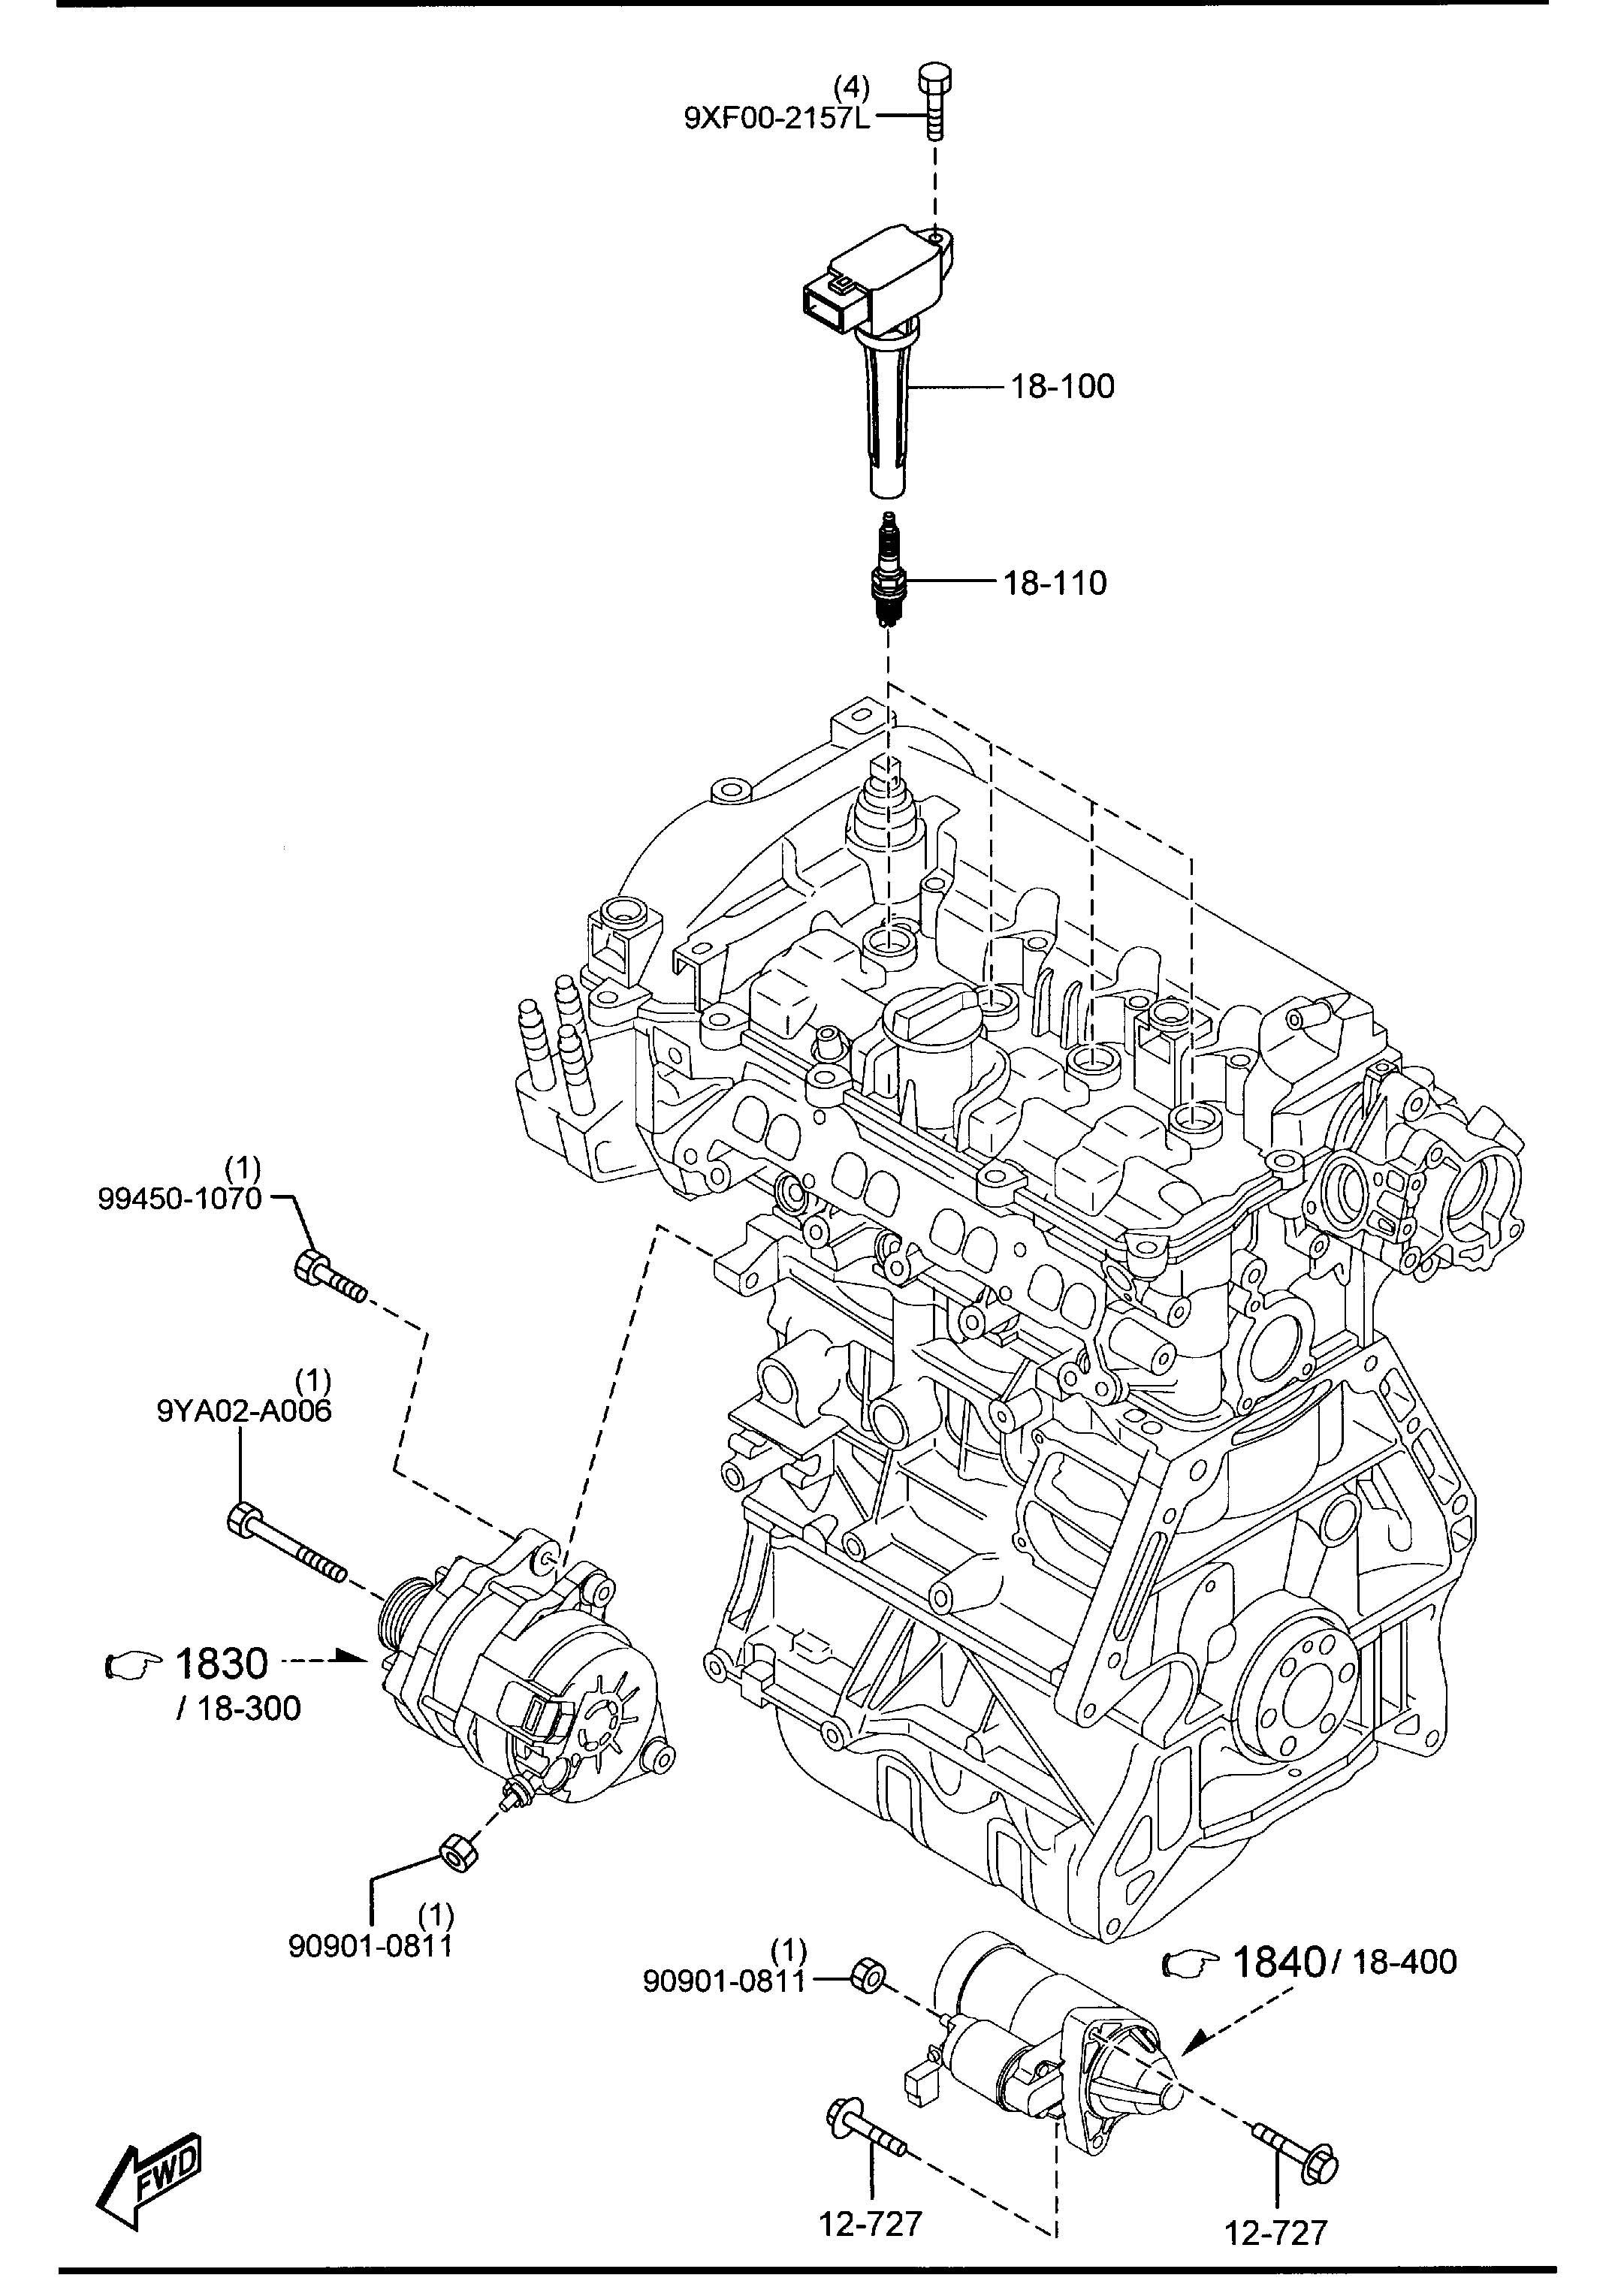 Engine Electrical System : Mazda engine electrical system